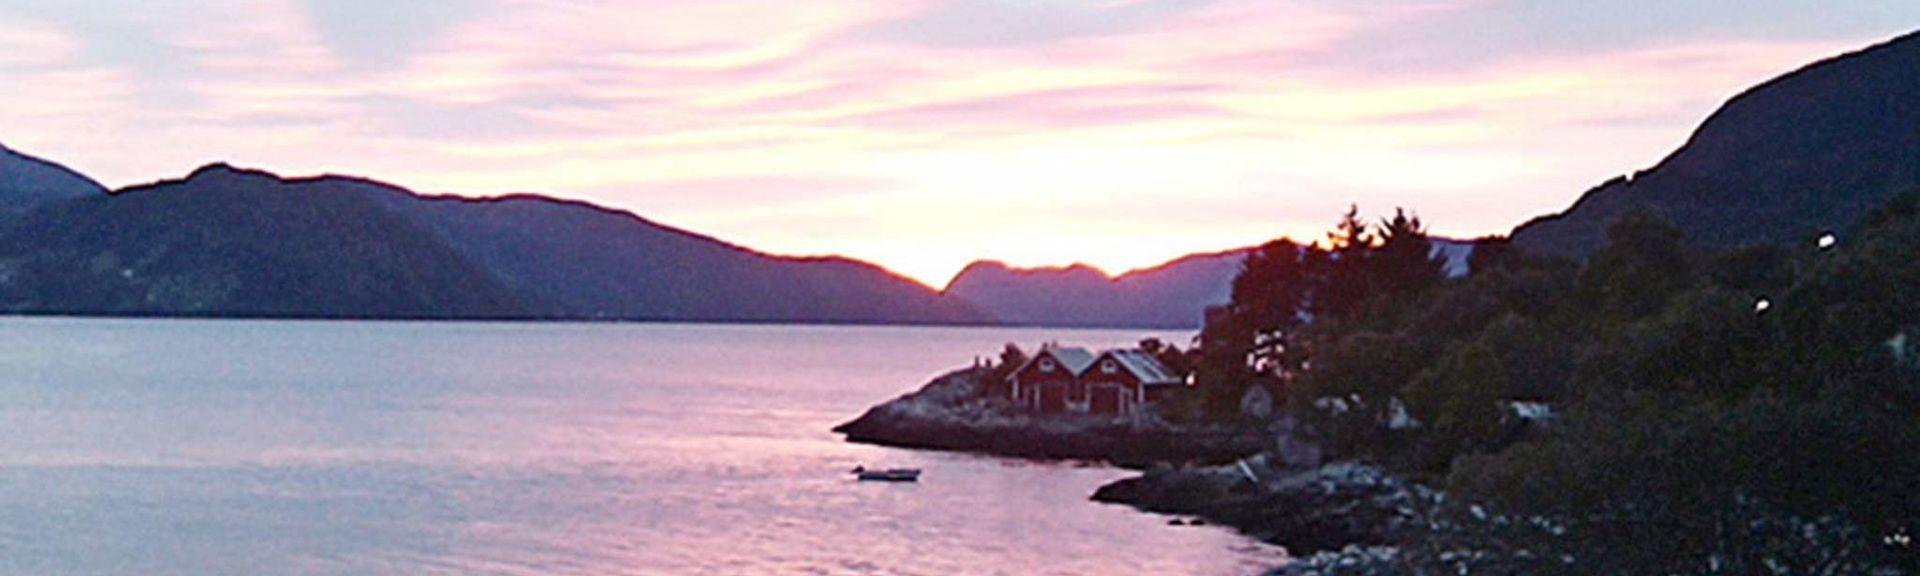 Vågsøy, Comté de Sogn og Fjordane, Norvège